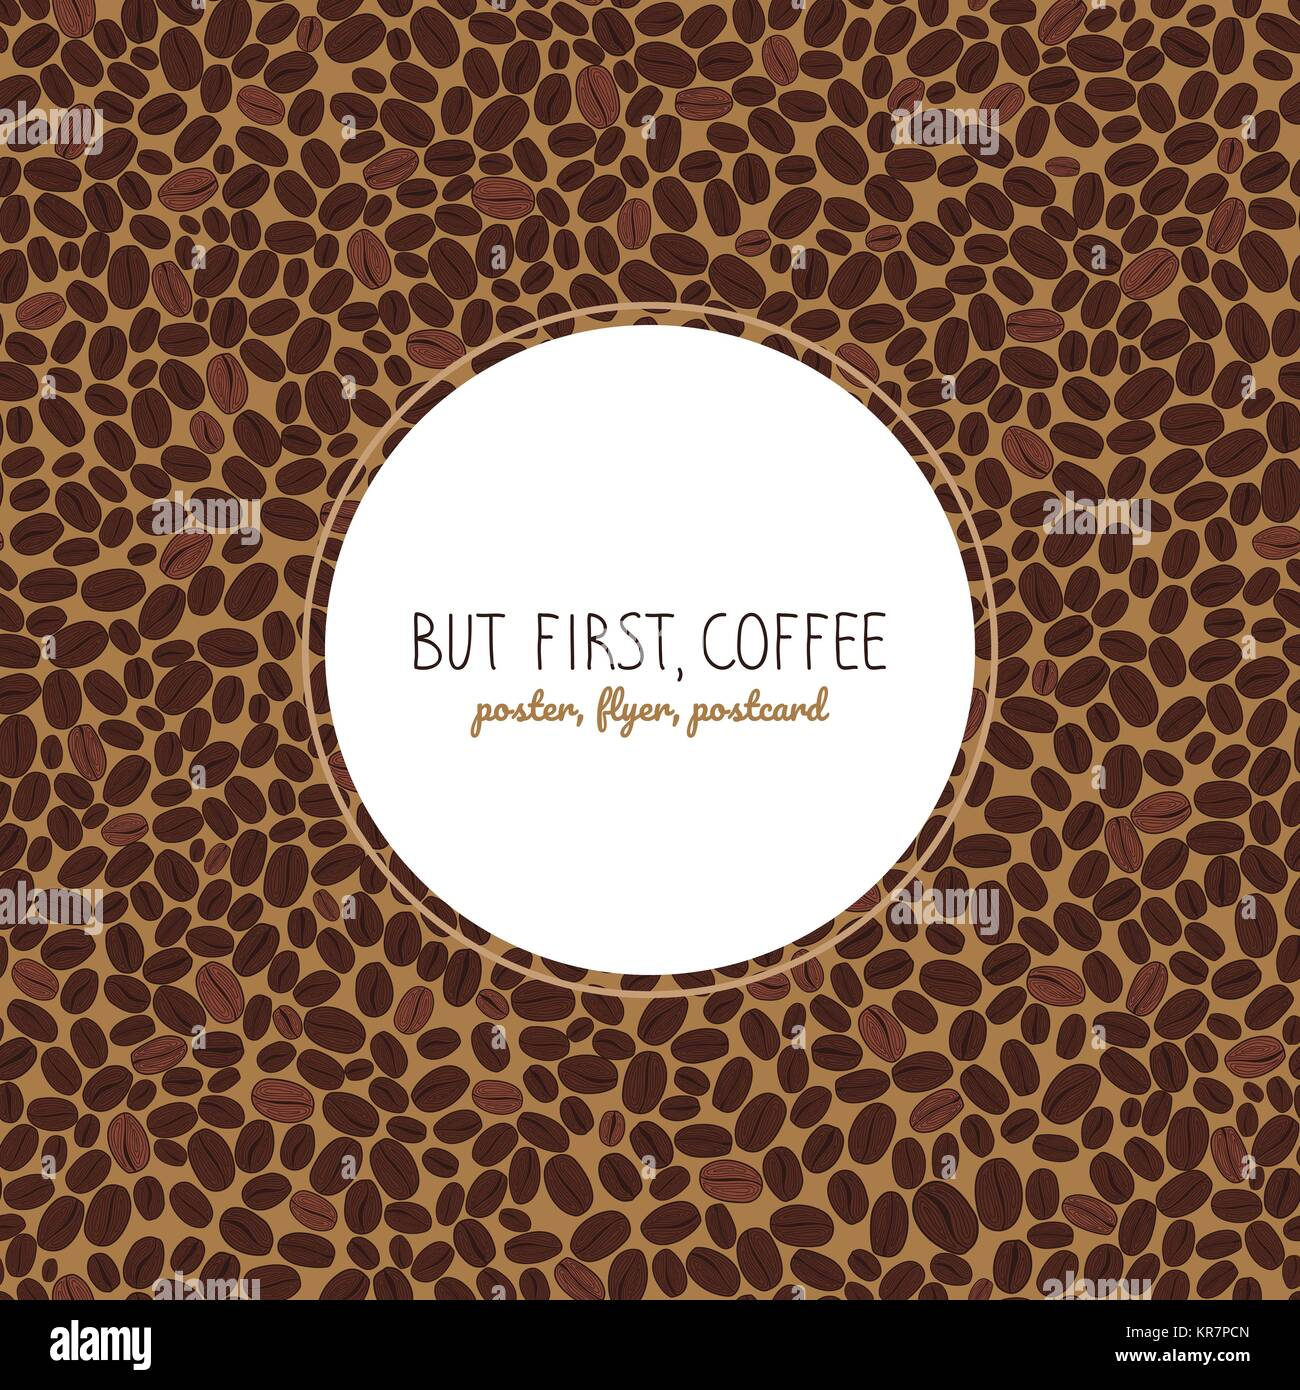 Aber zuerst, Kaffee. Flyer oder Poster. Geröstete Kaffeebohnen ...